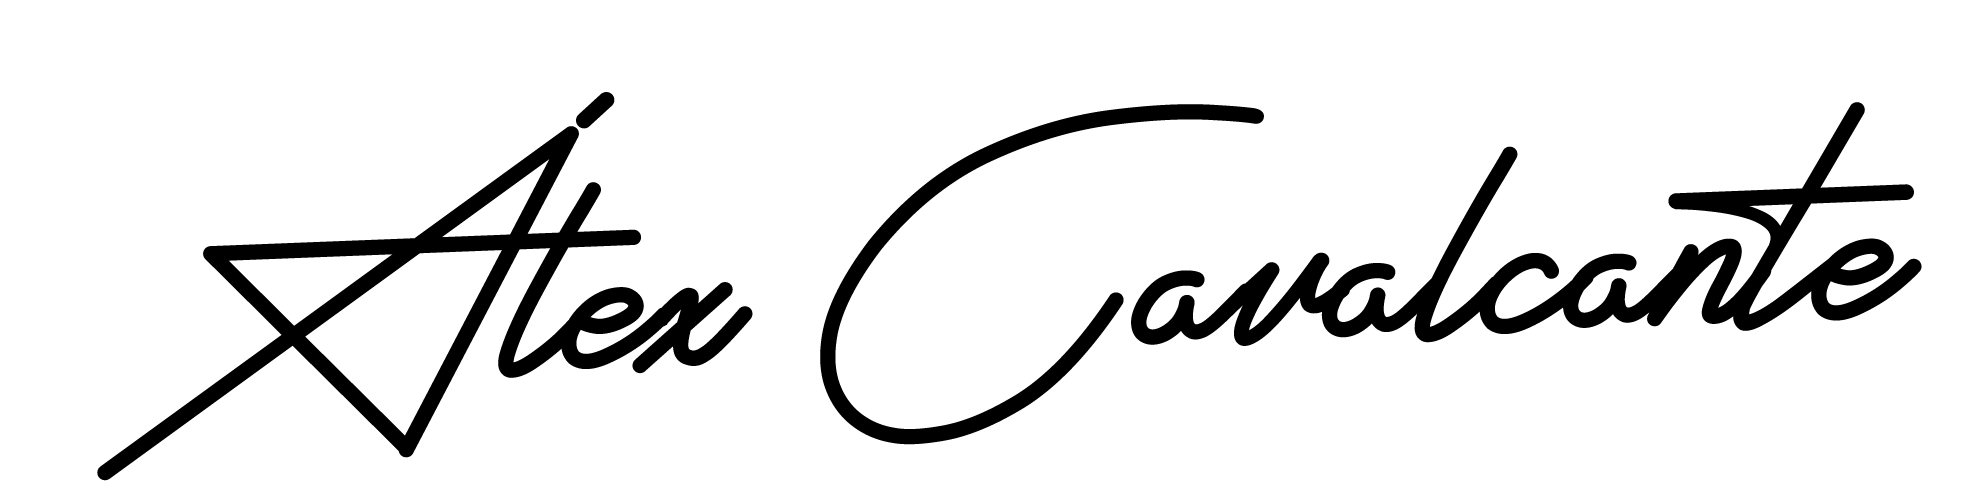 Álex Cavalcante Logo